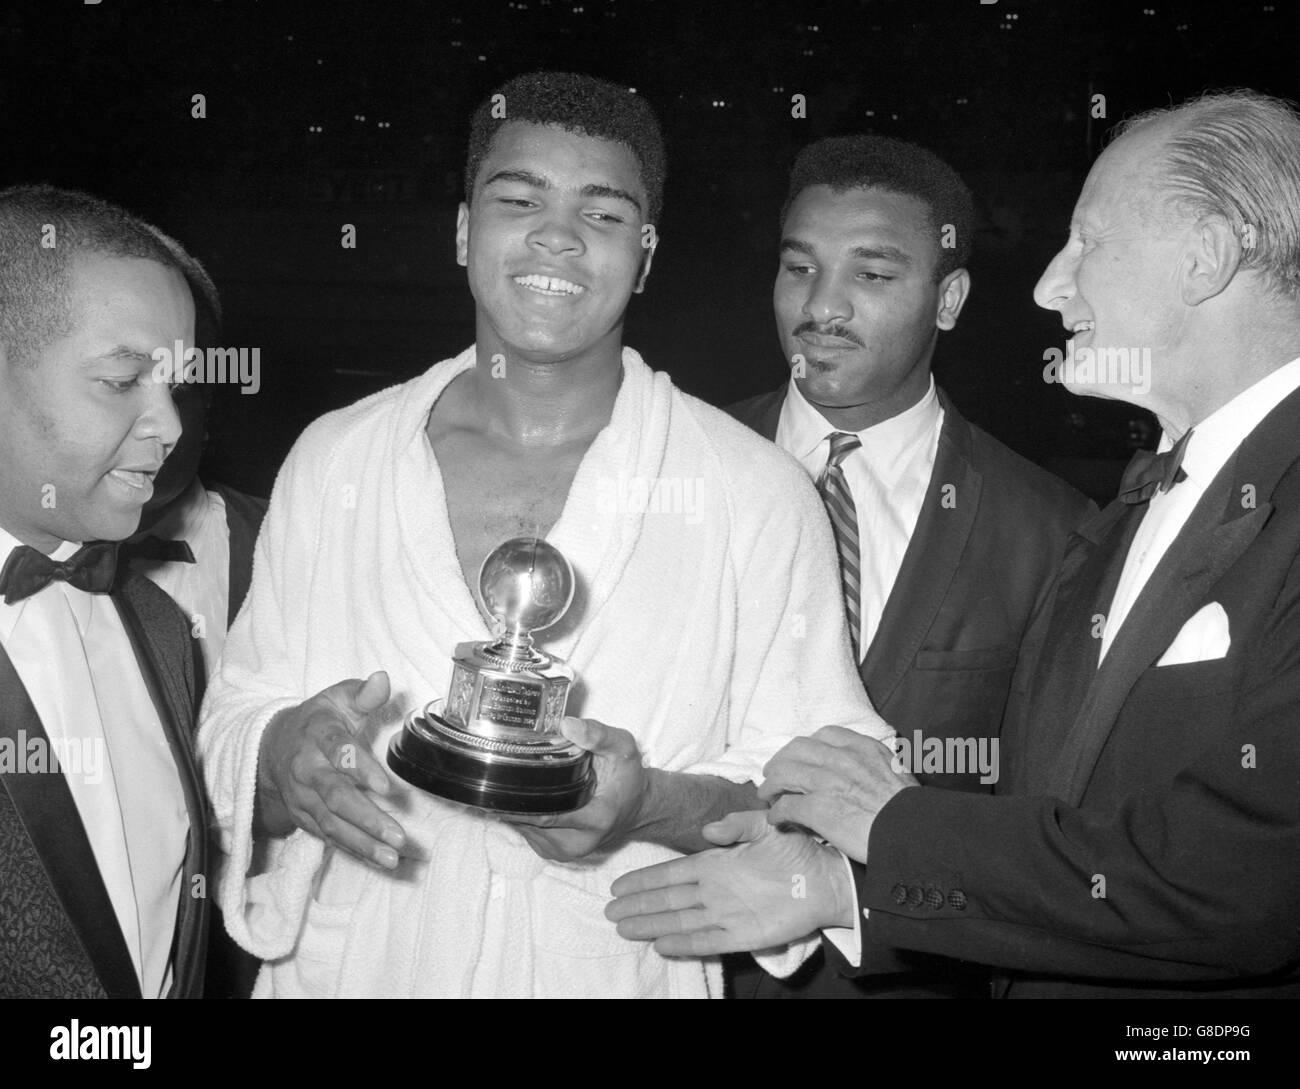 Boxing - World Heavyweight Championship - Muhammad Ali v Brian Londra - Earls Court Arena Foto Stock